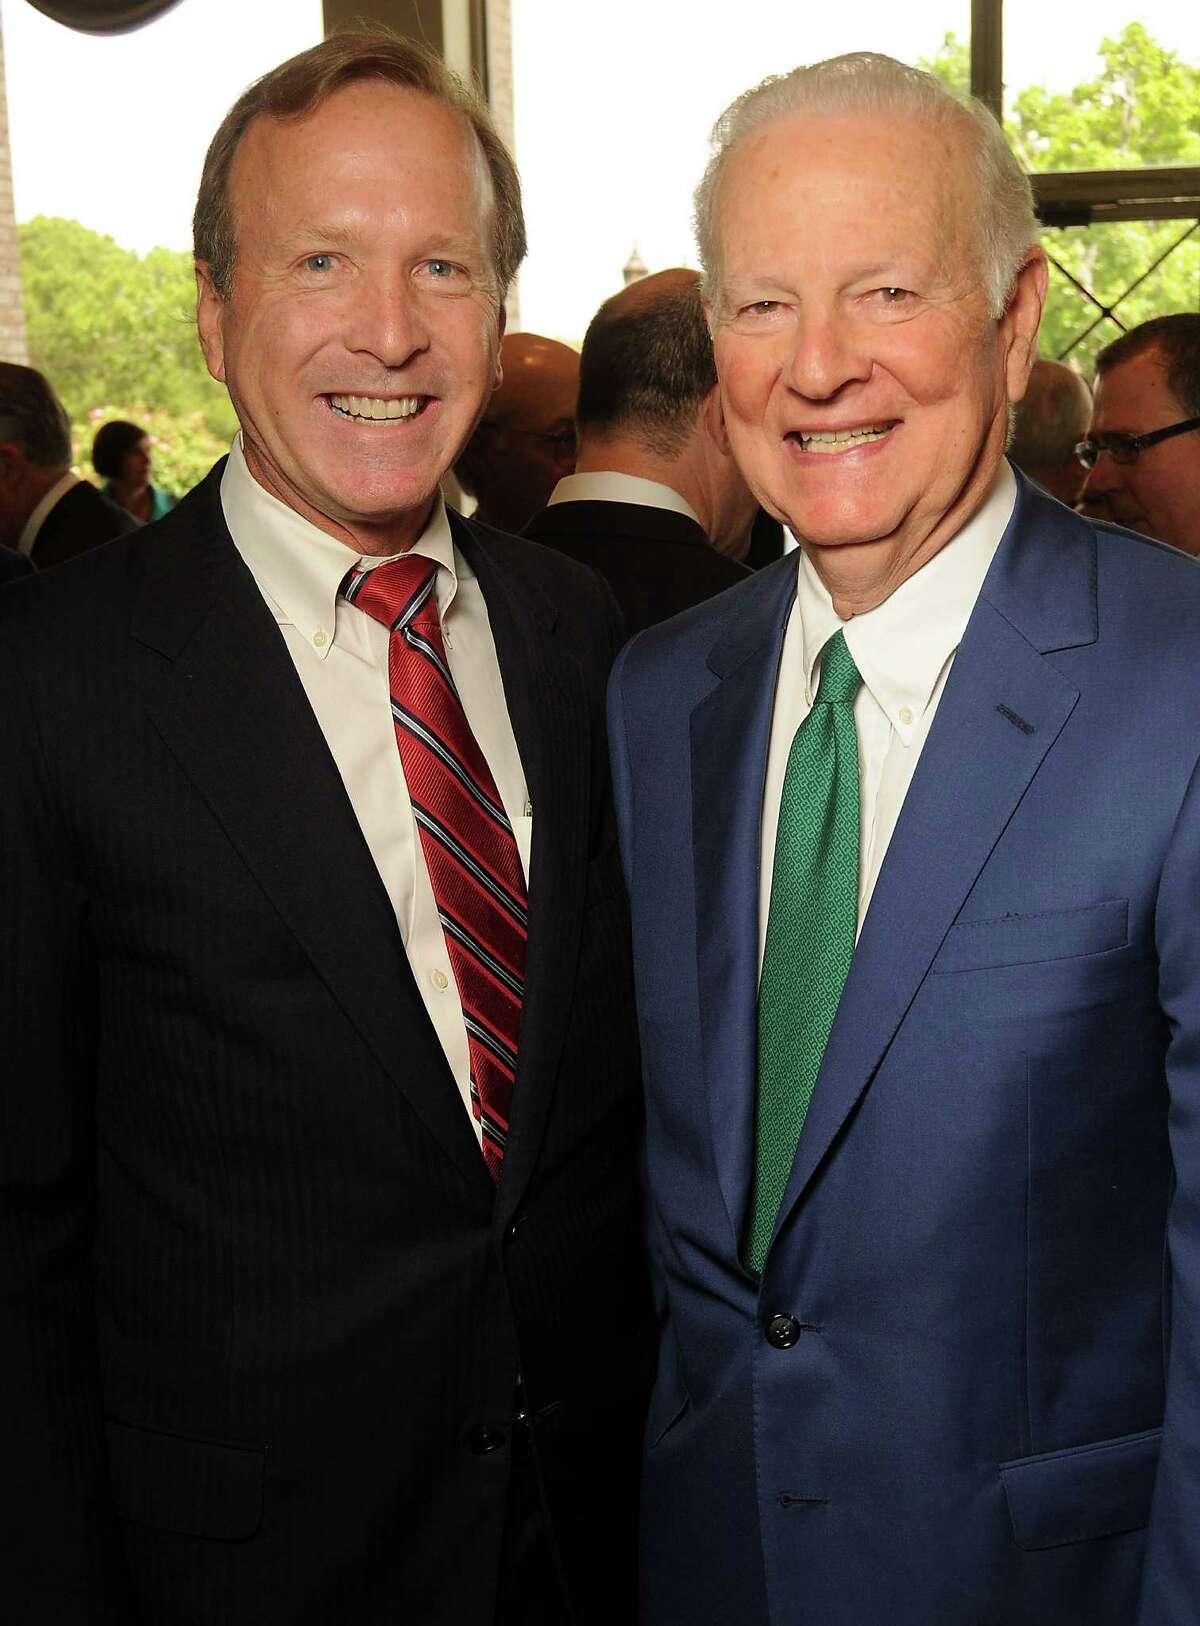 Neil Bush and James Baker III